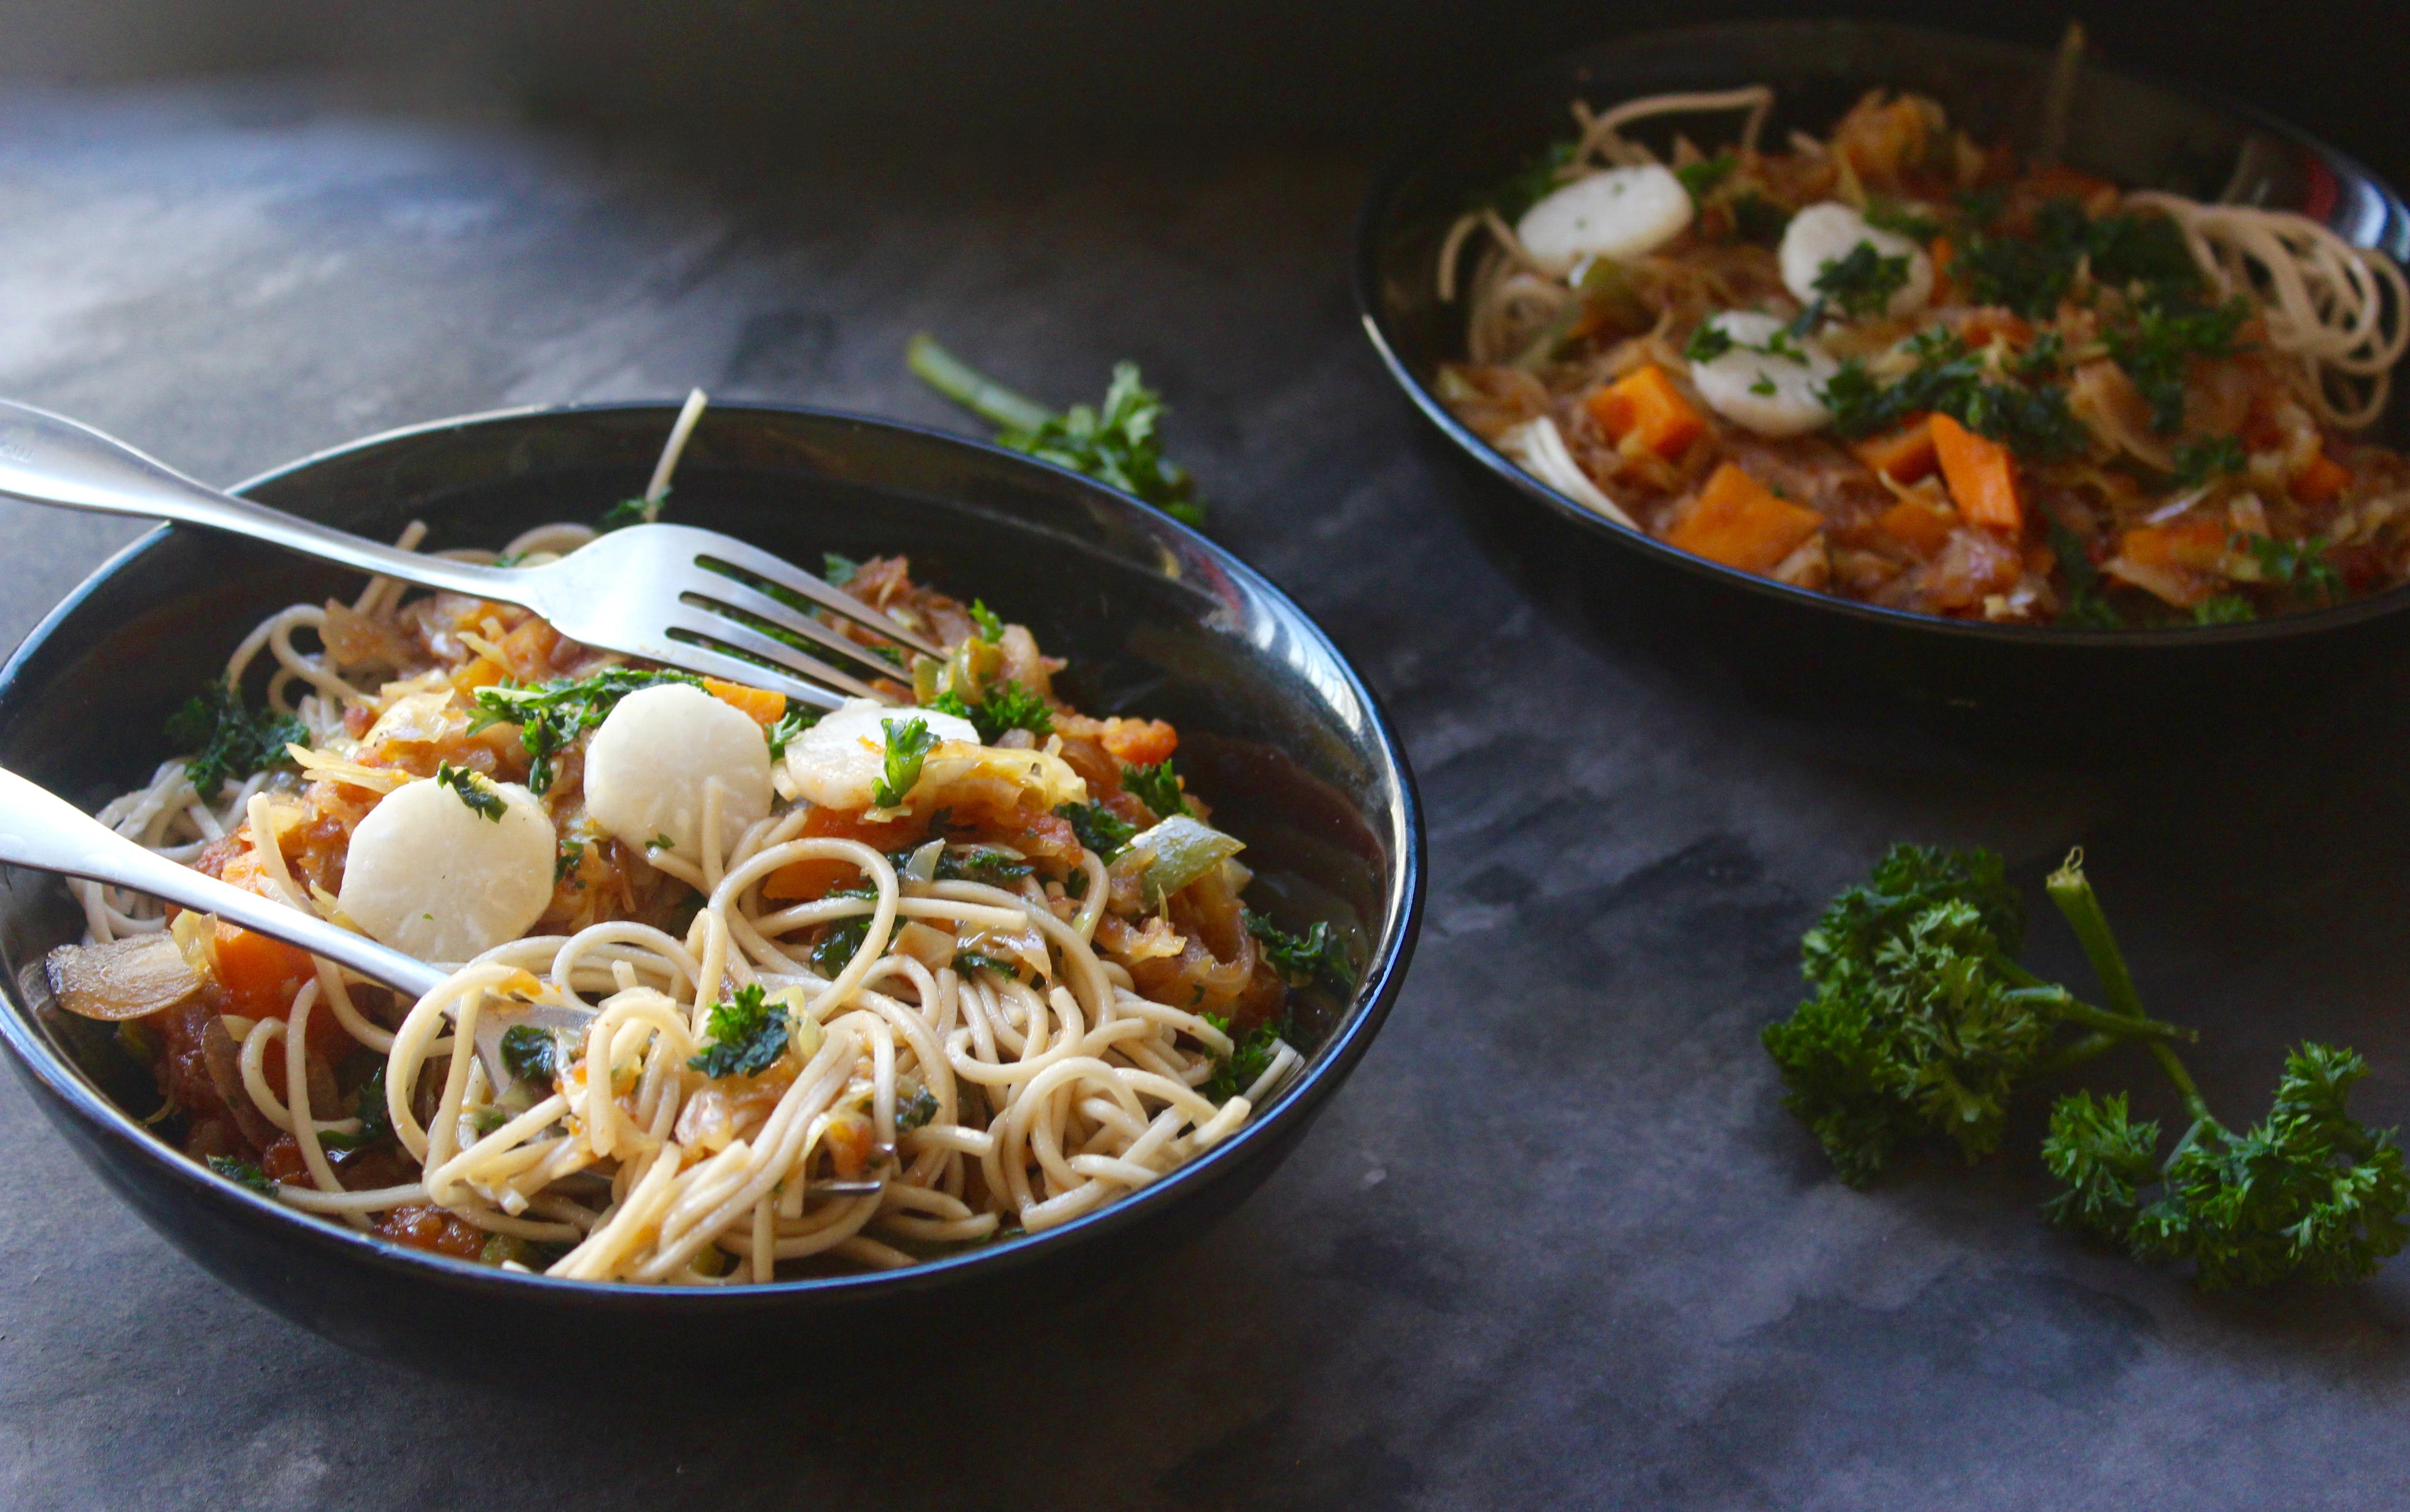 Thukpa (an Indian North Eastern/Tibetan/Burmese Noodle Soup)